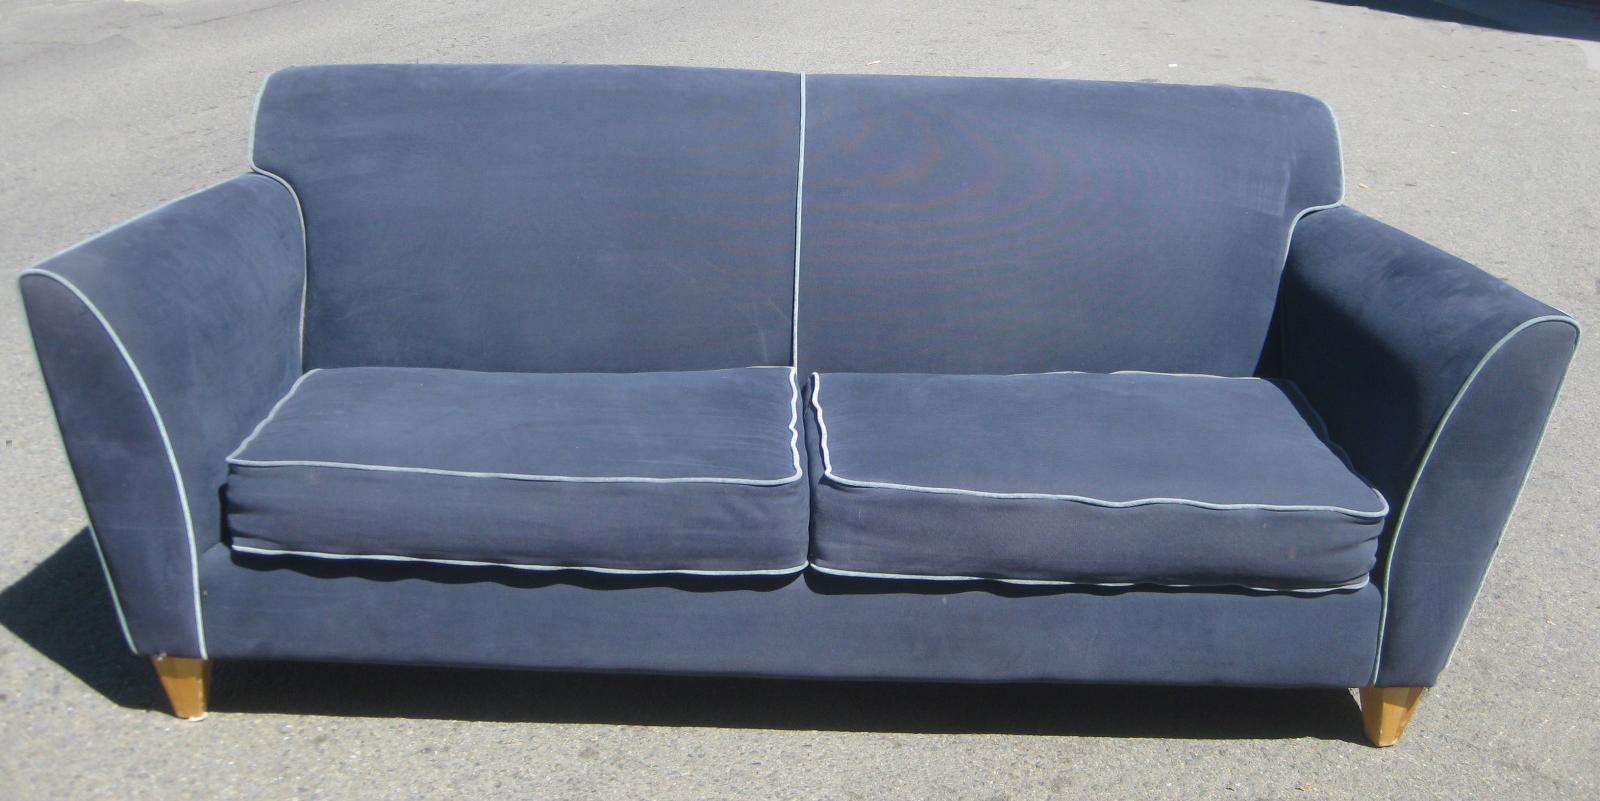 Uhuru Furniture Collectibles Sold